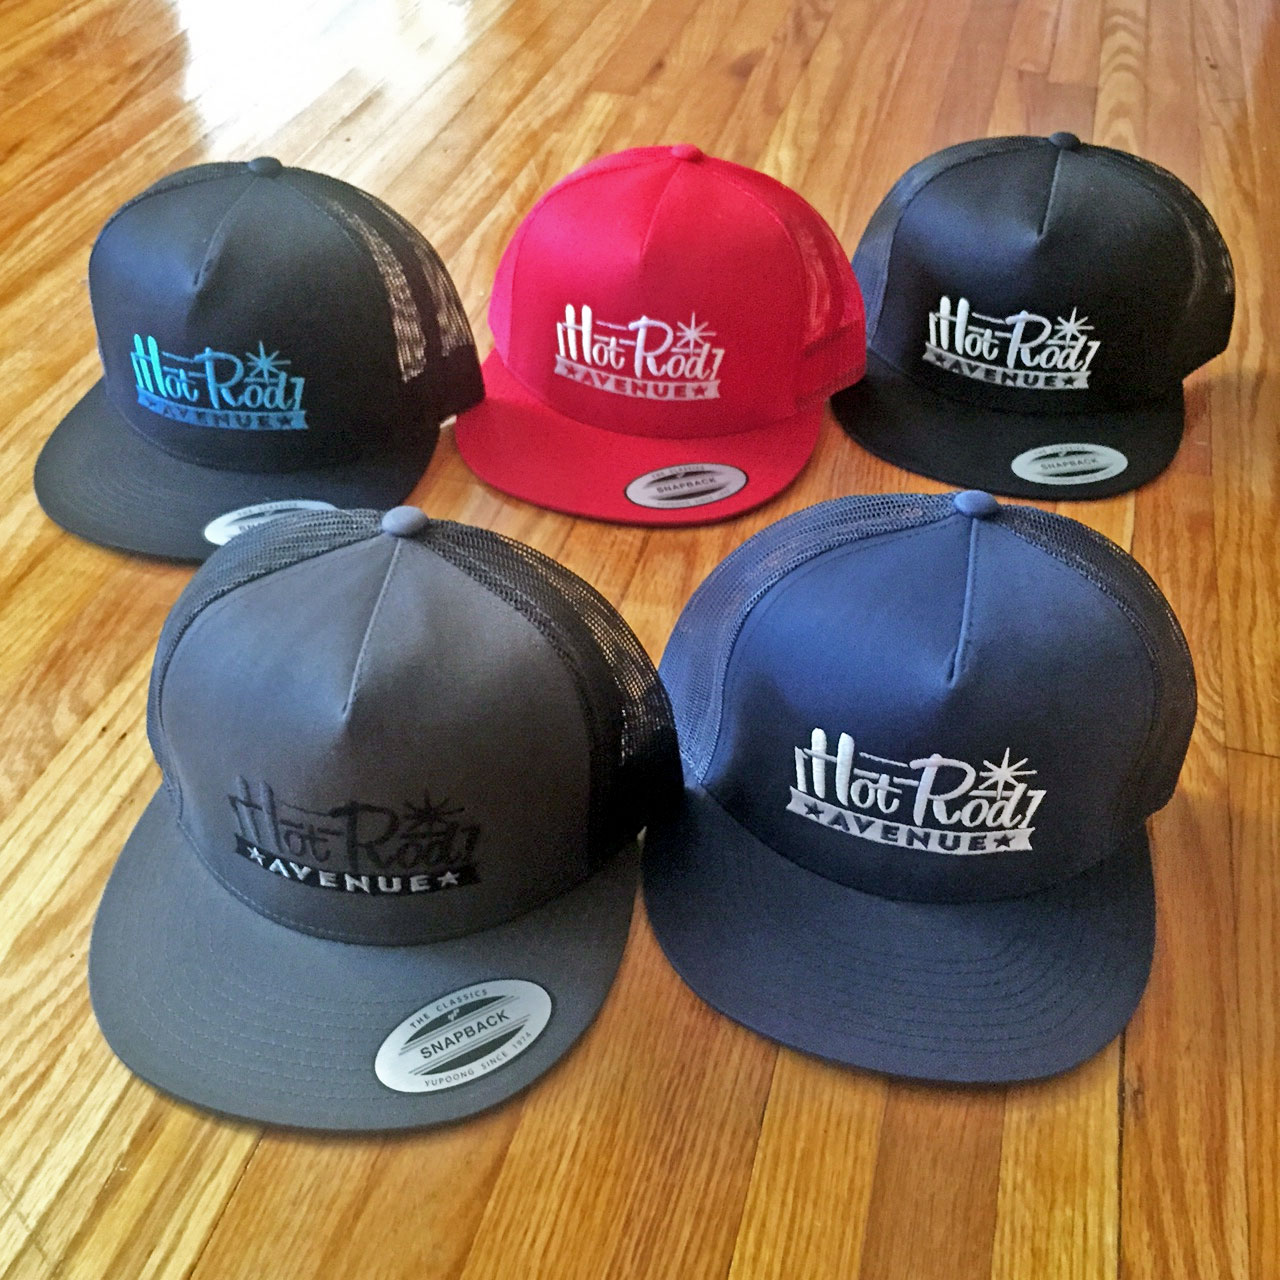 Hot Rod Avenue Classic Flatbill Trucker Hats – Low Label 1816748bc7ce